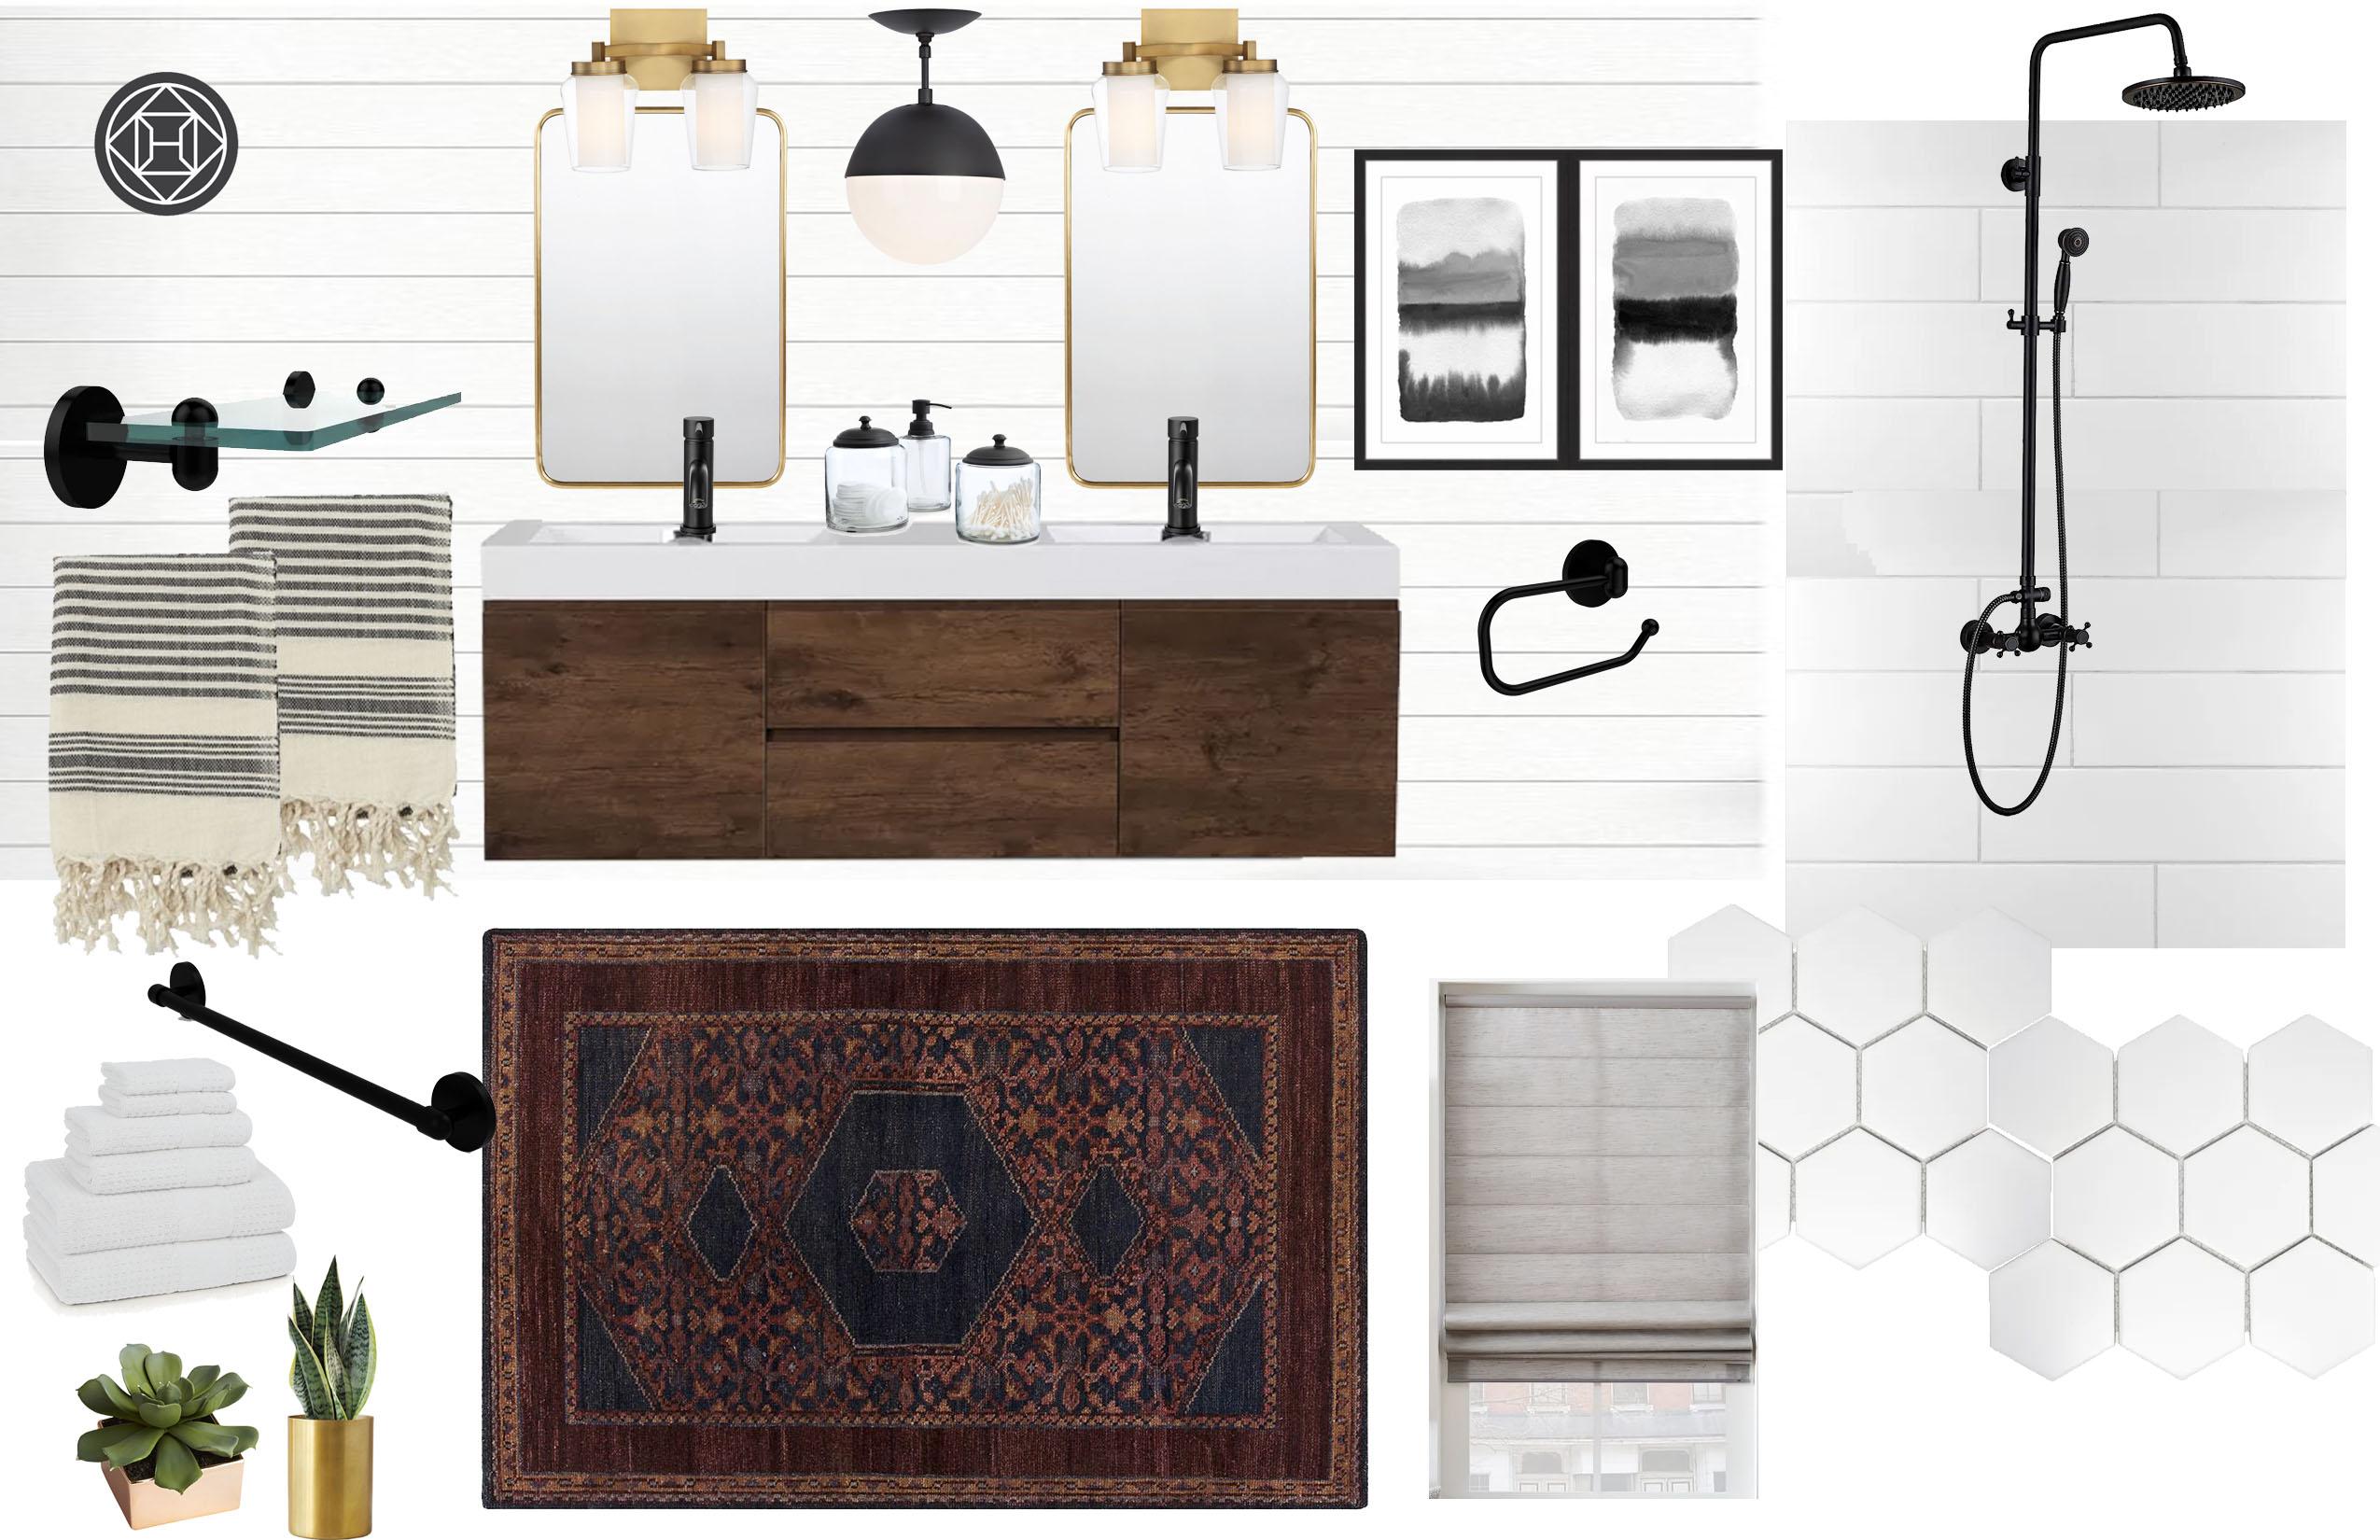 Transitional, Midcentury Modern Bathroom Design by Havenly Interior ...